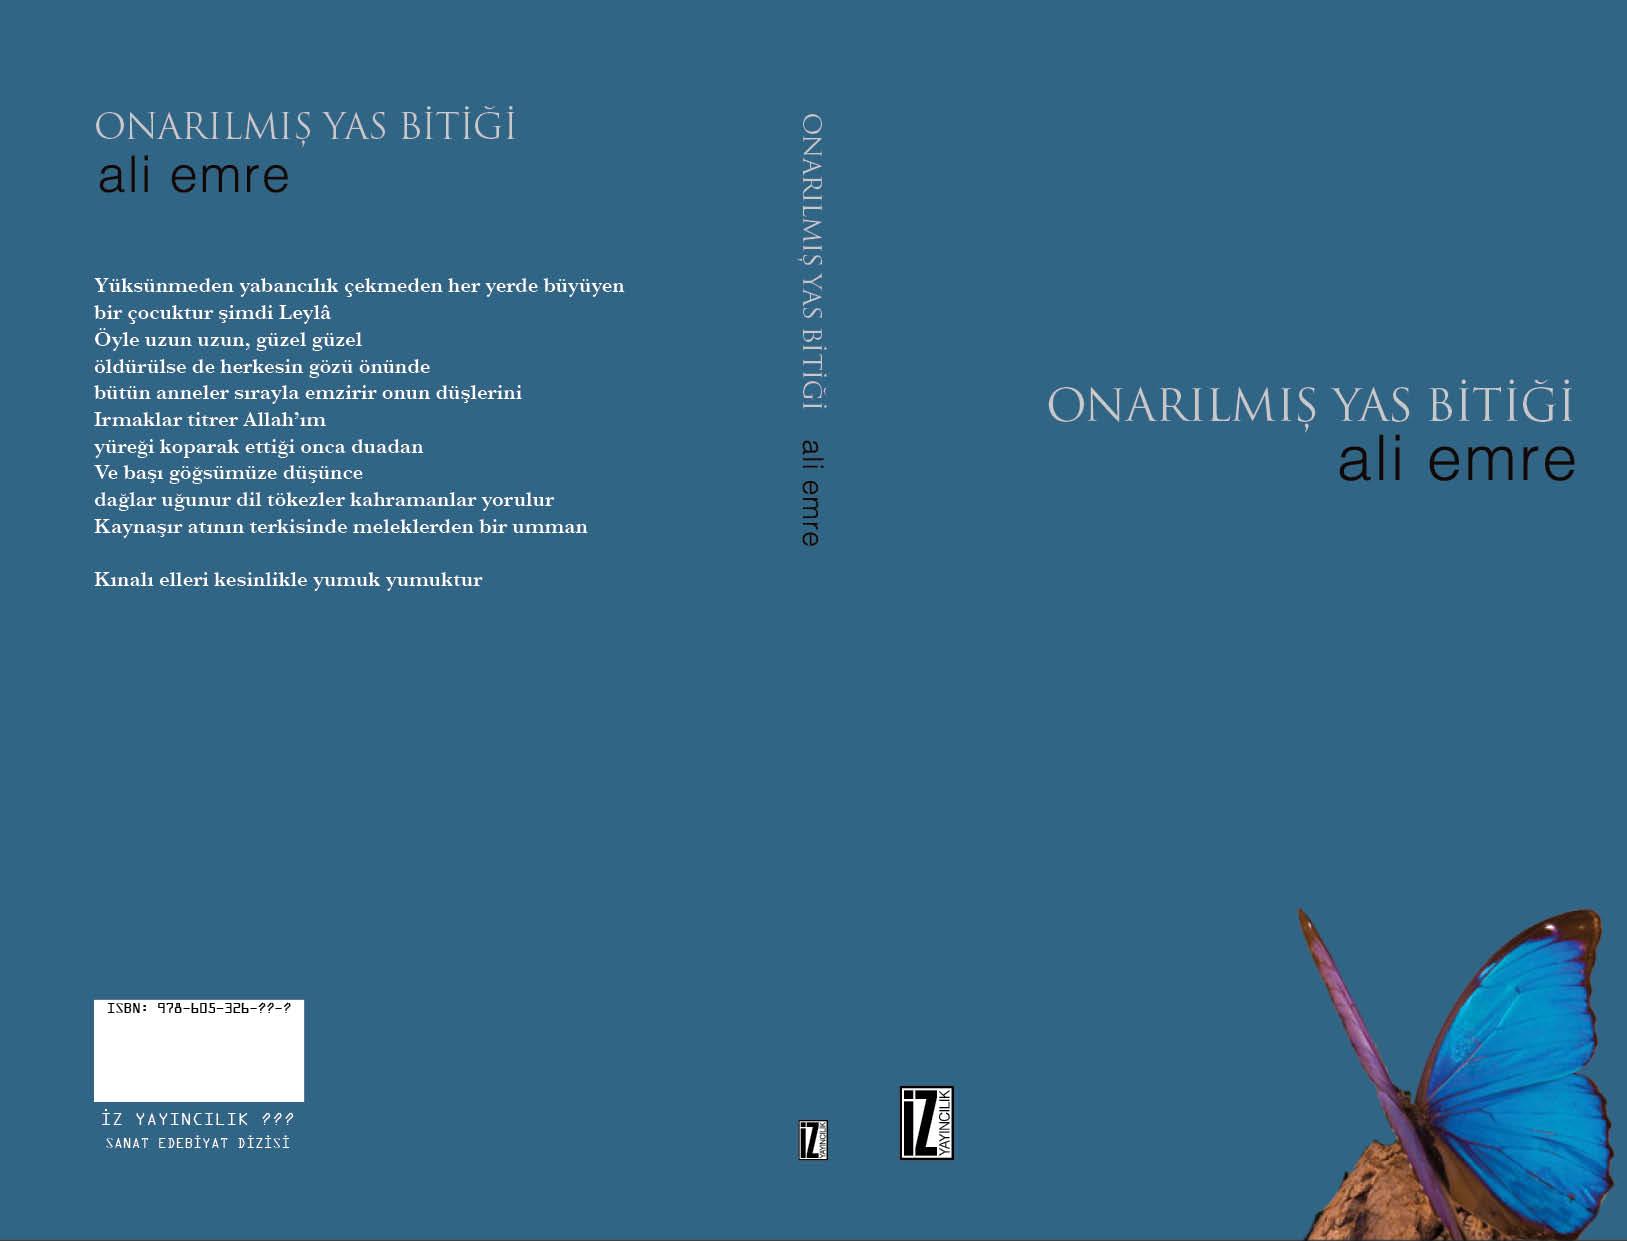 onarilmis-yas-bitigi-(2).jpg